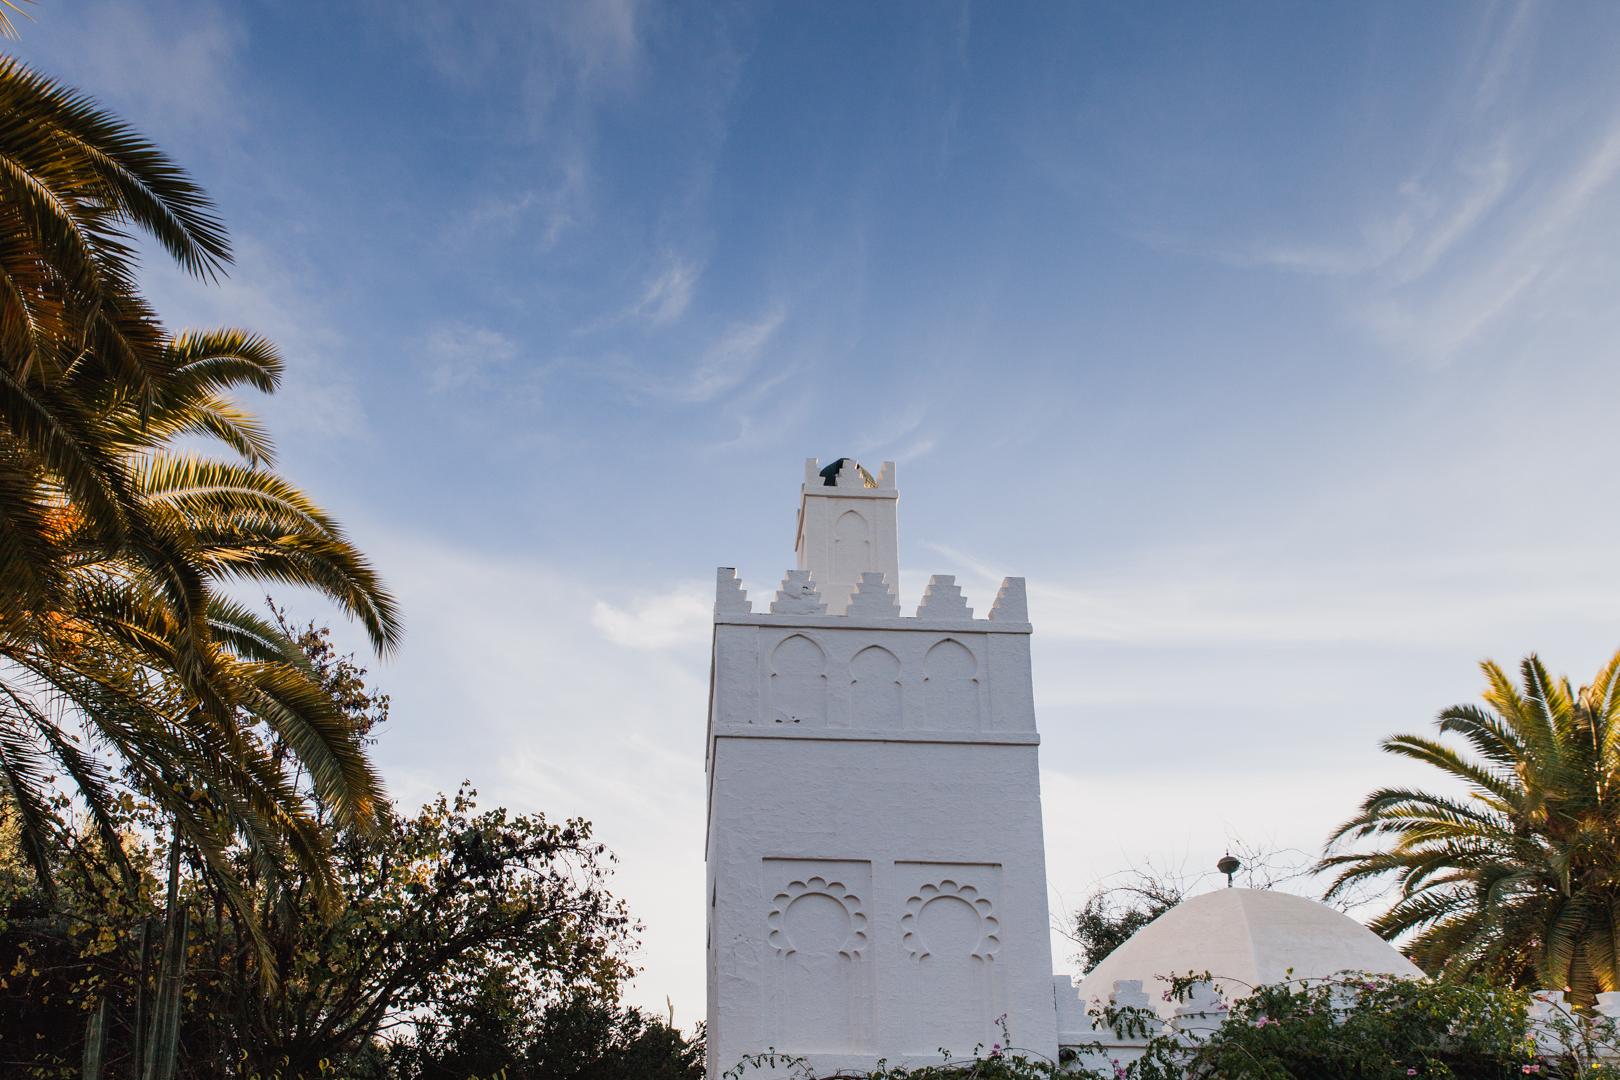 3-boda hacienda torre doña maria. carlos pavon fotografia. 600257783-31.jpg